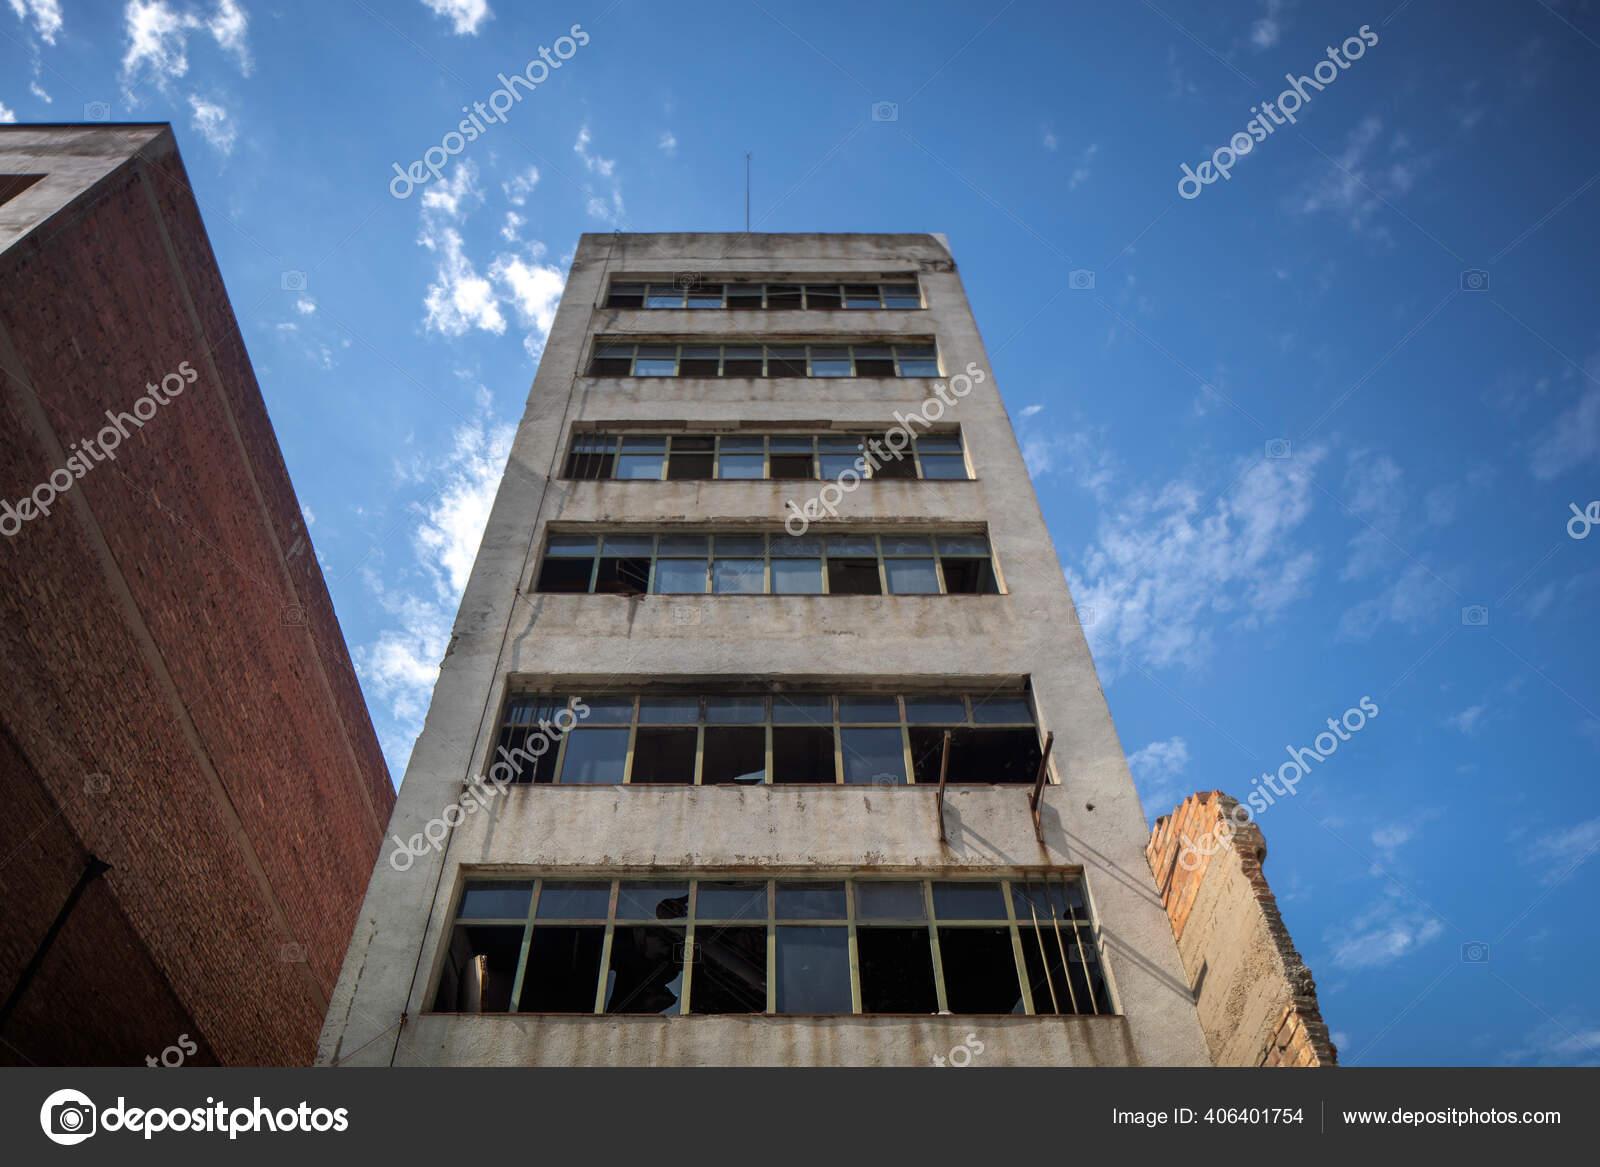 Abandoned Building El Poblenou Barcelona Spain Stock Photo C Dubassy 406401754